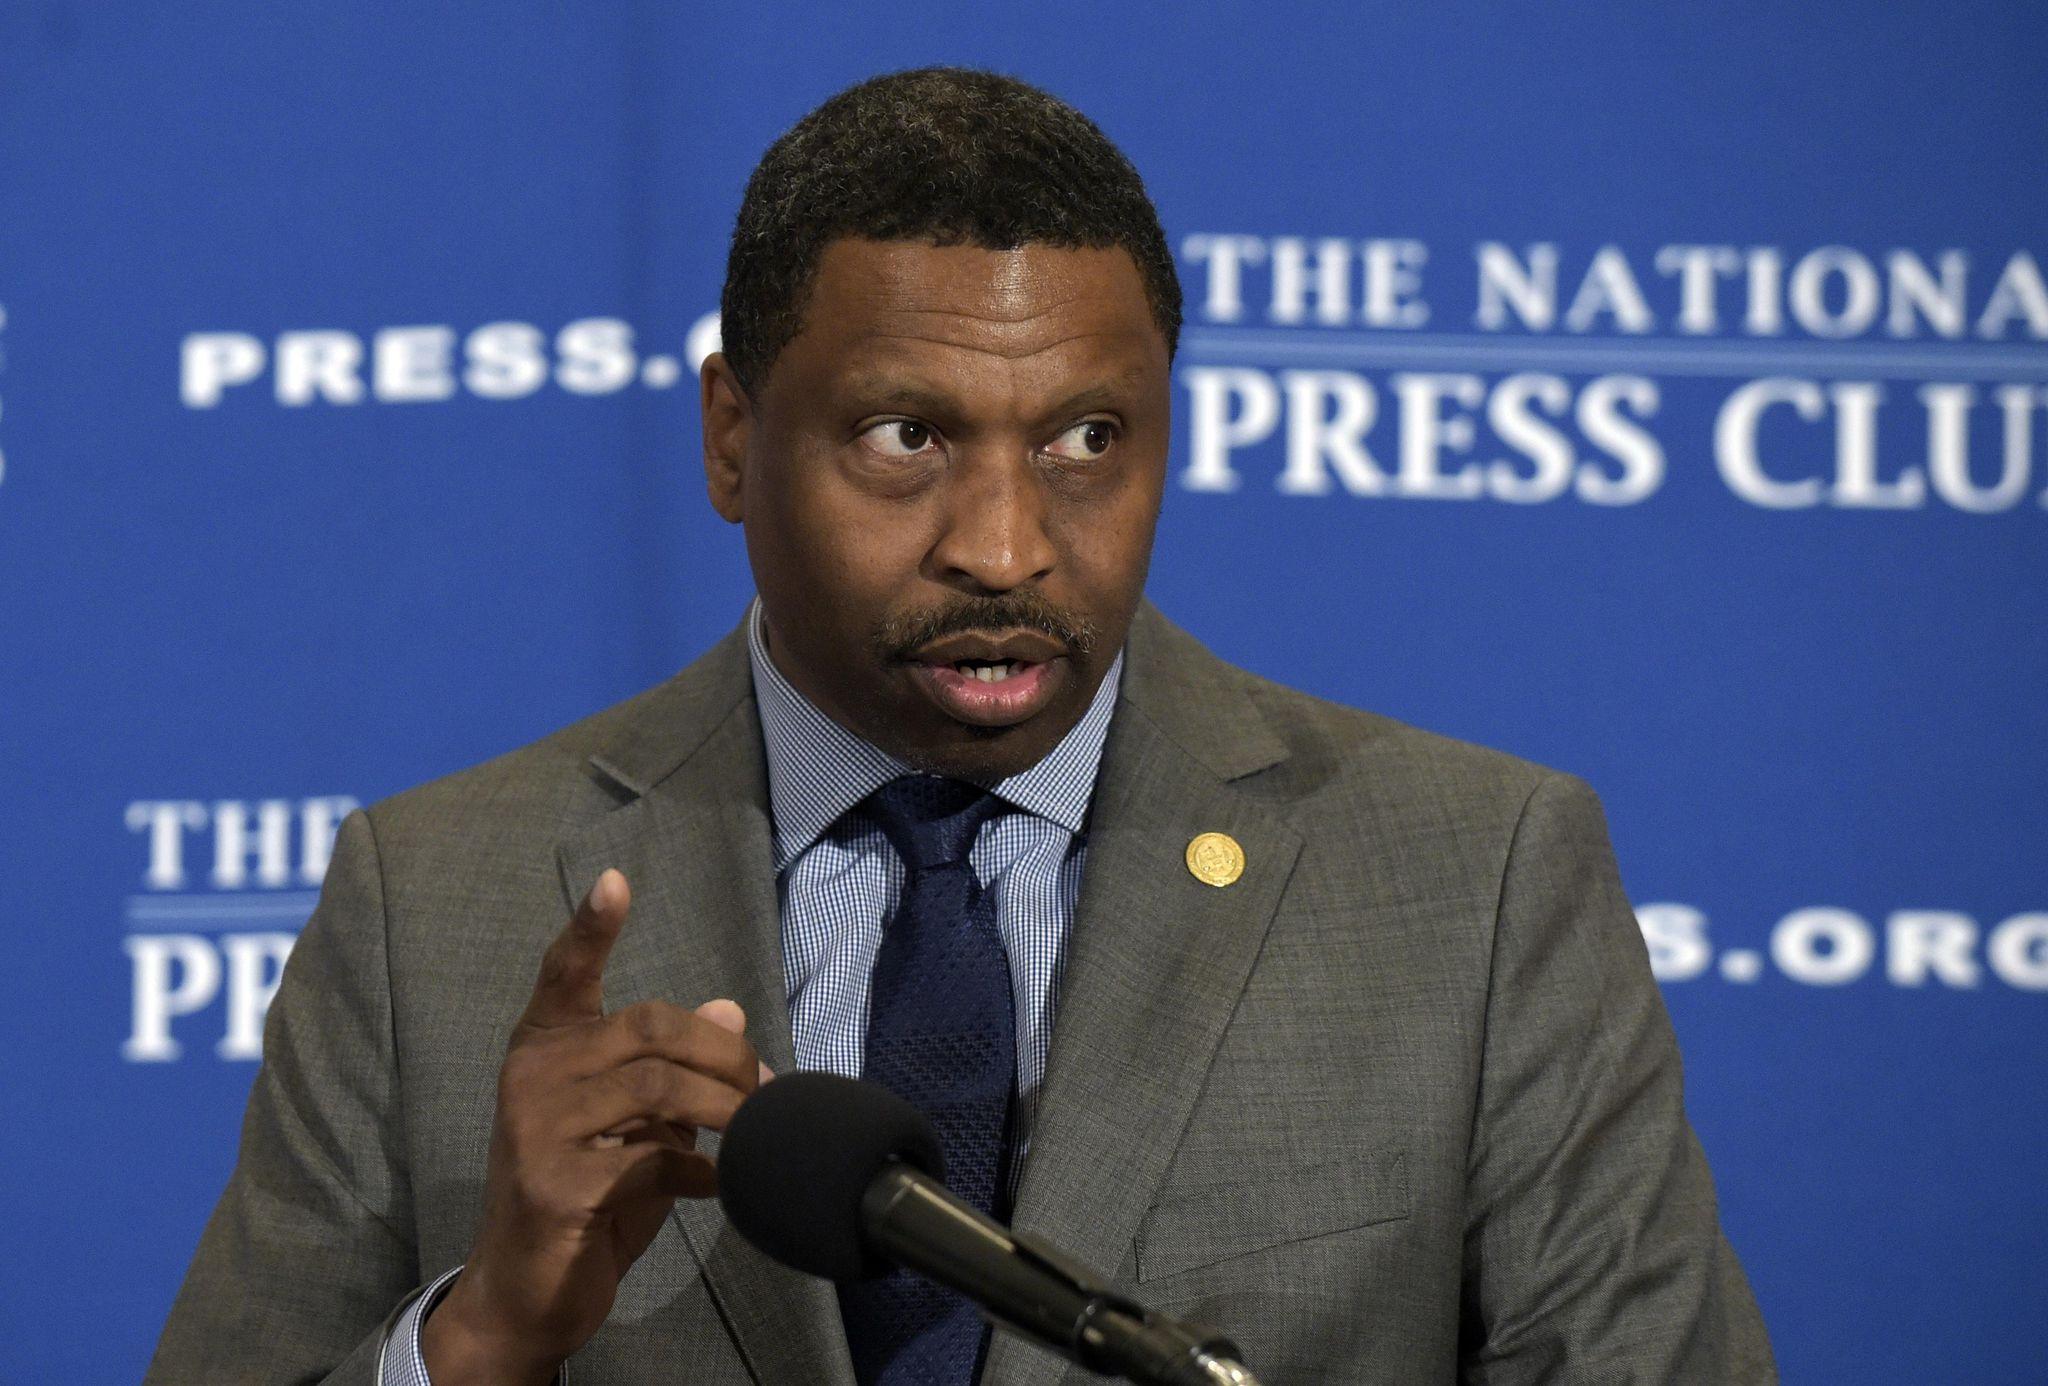 Derrick Johnson, NAACP president: Donald Trump is a racist